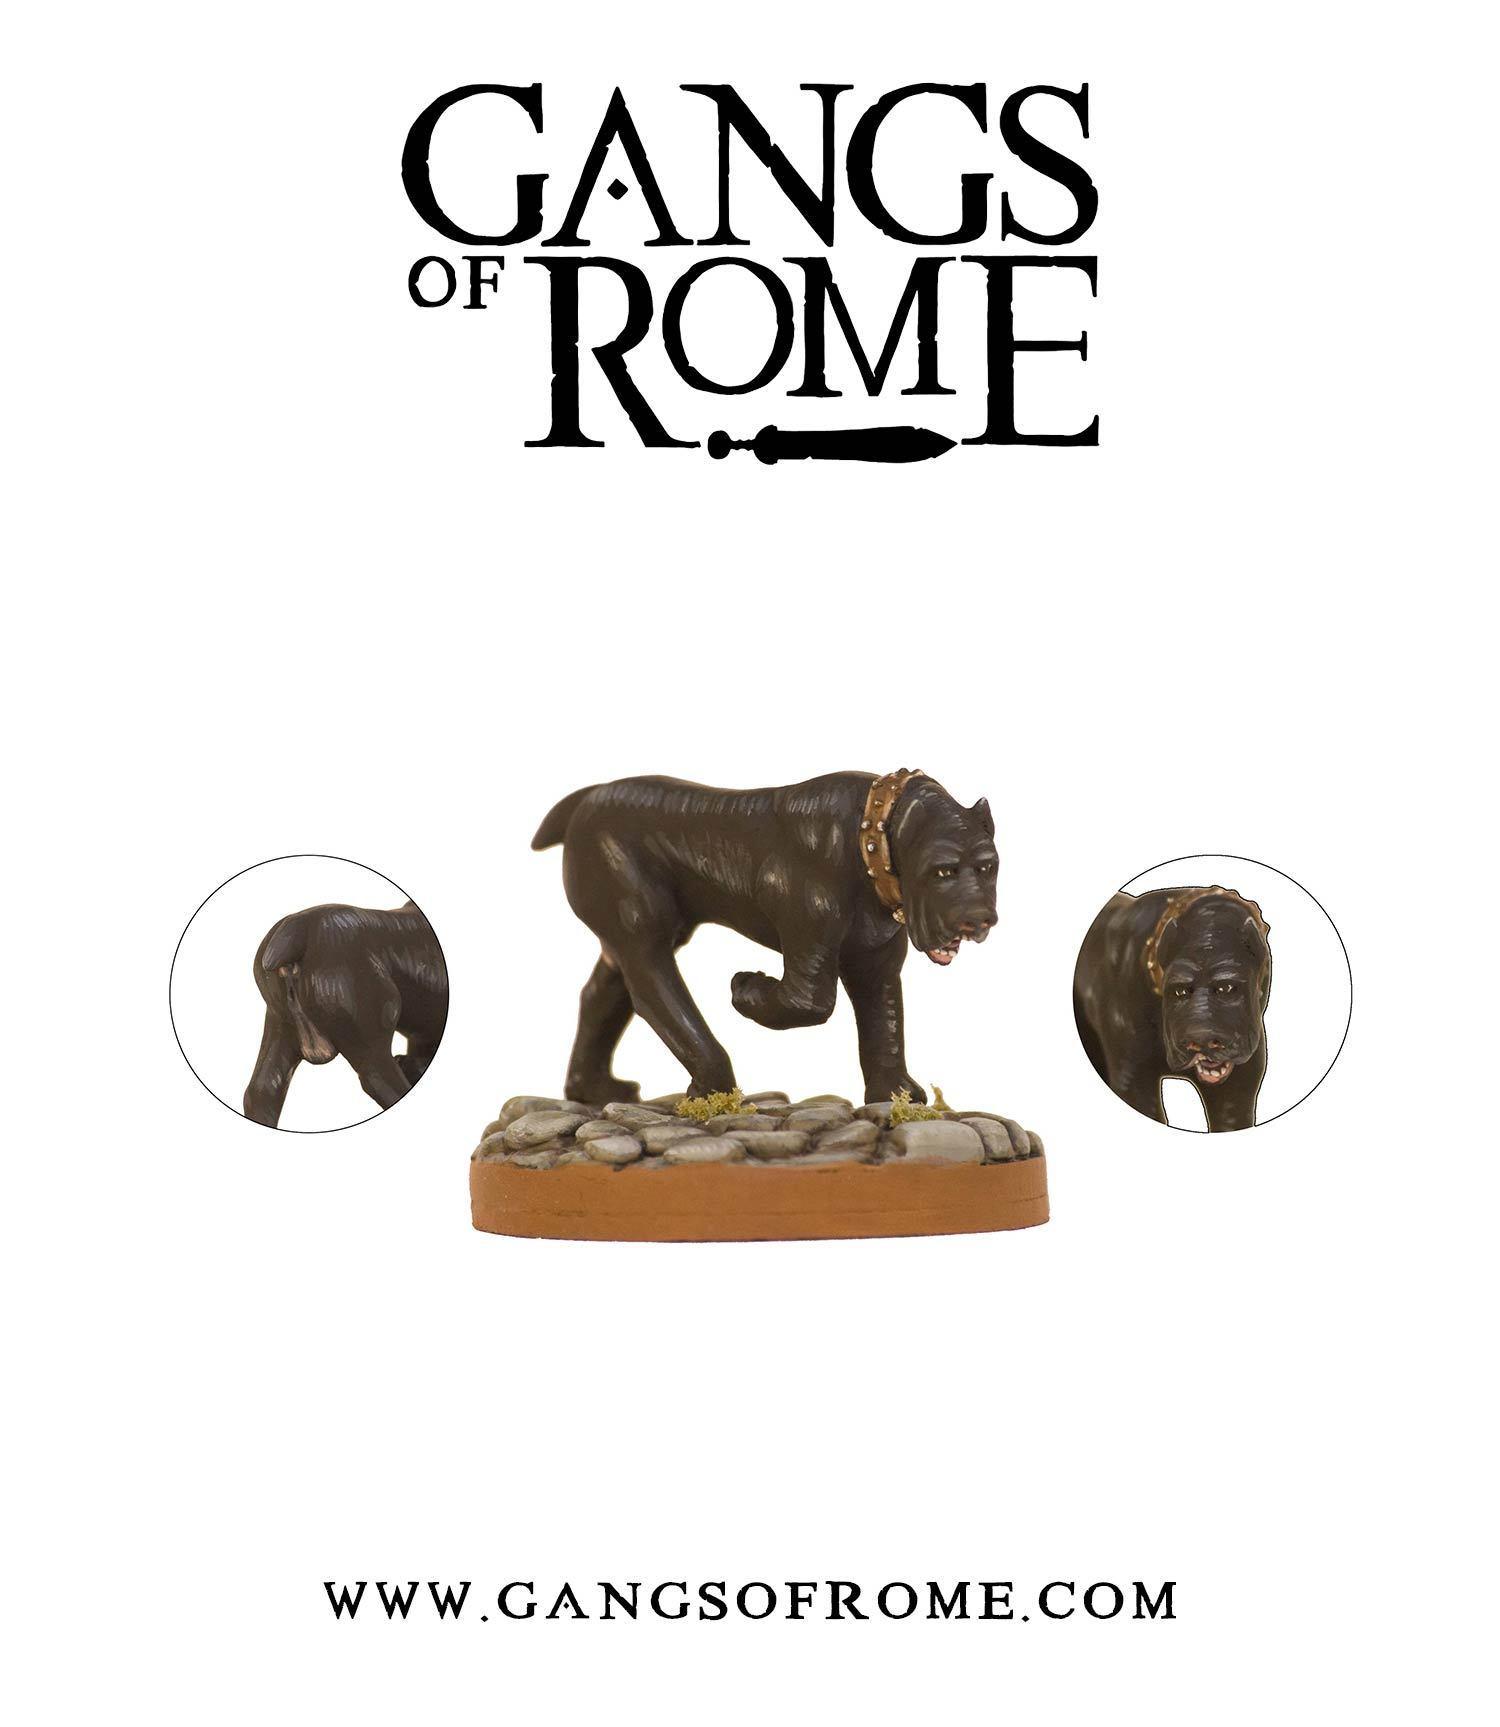 Fierce Mastiff, Gangs of Rome